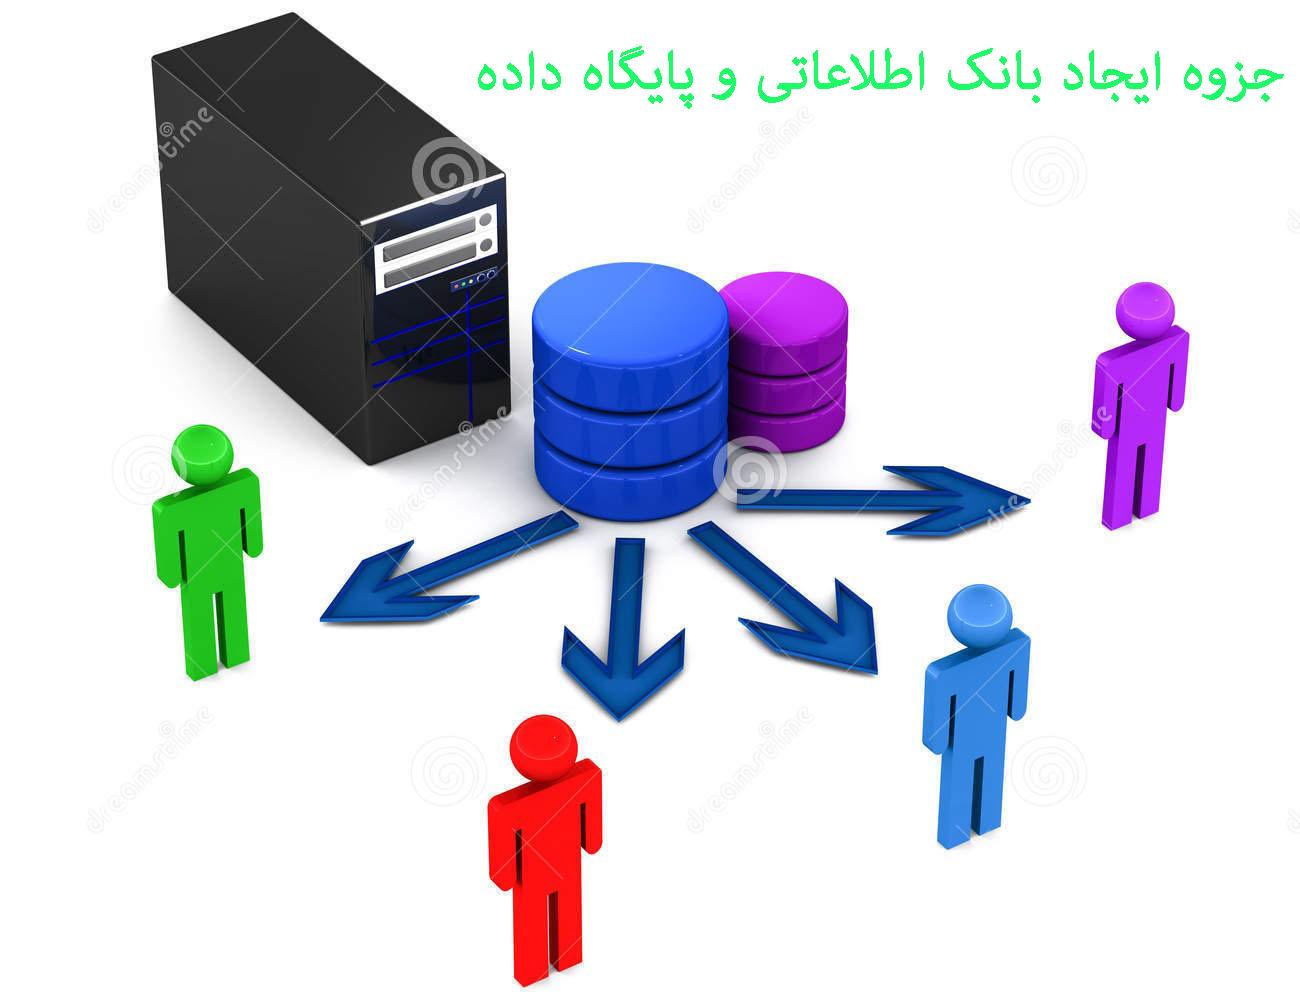 data دانلود جزوه ایجاد بانک اطلاعاتی و پایگاه داده